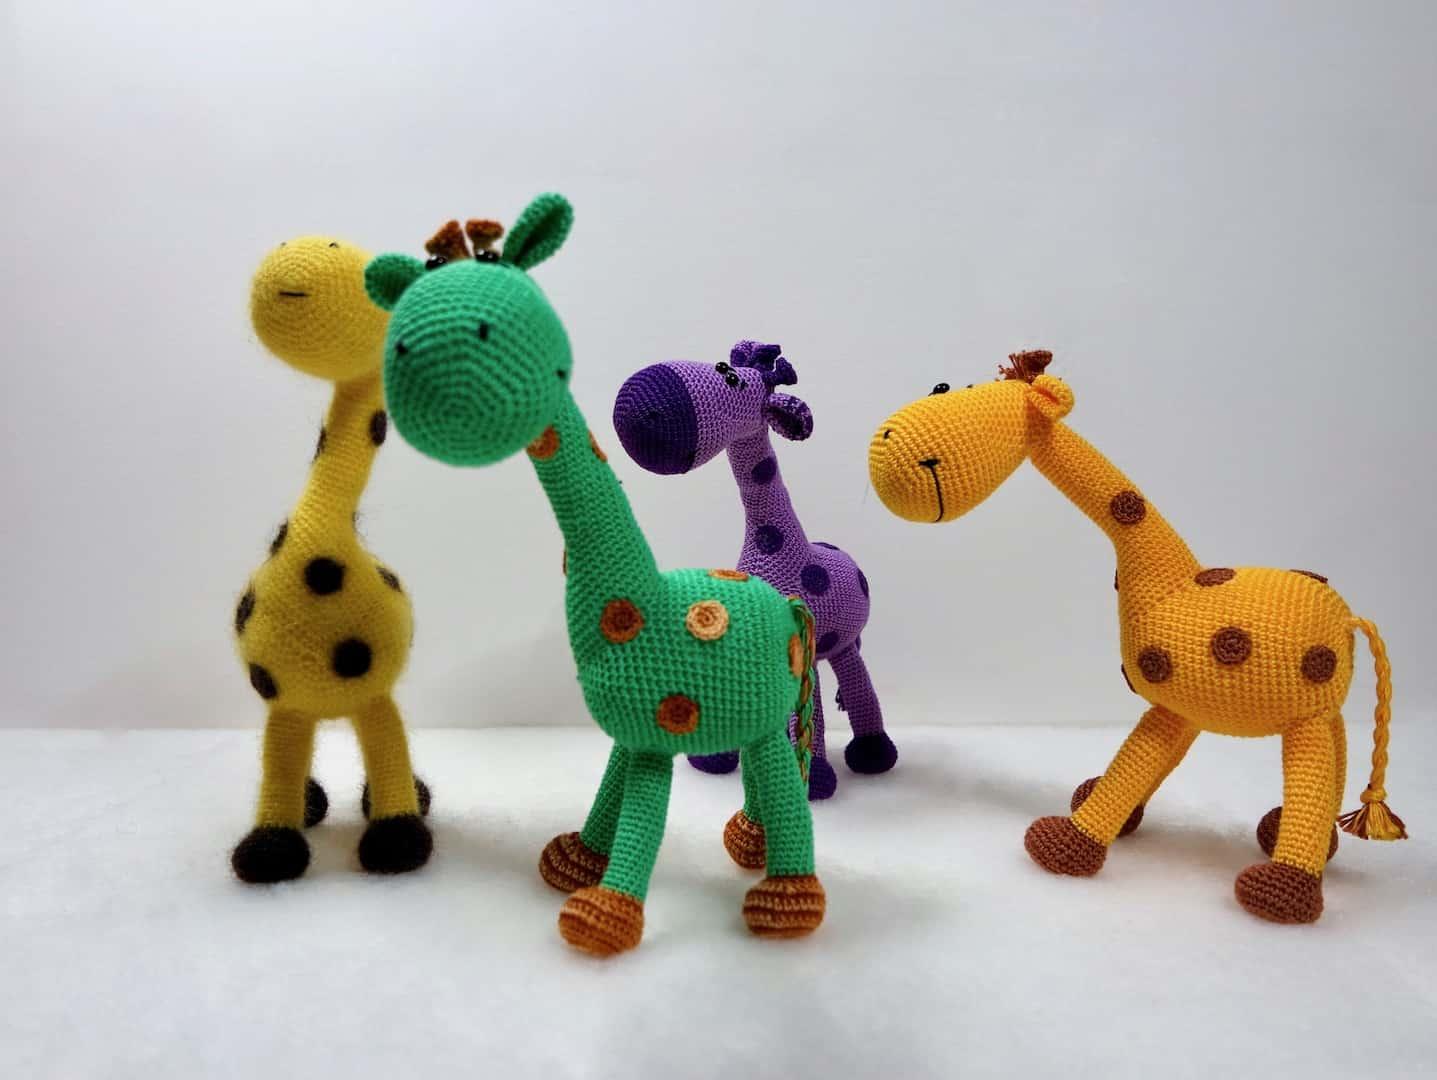 crochet pattern, english or german, giraffe Gerry | 1080x1437